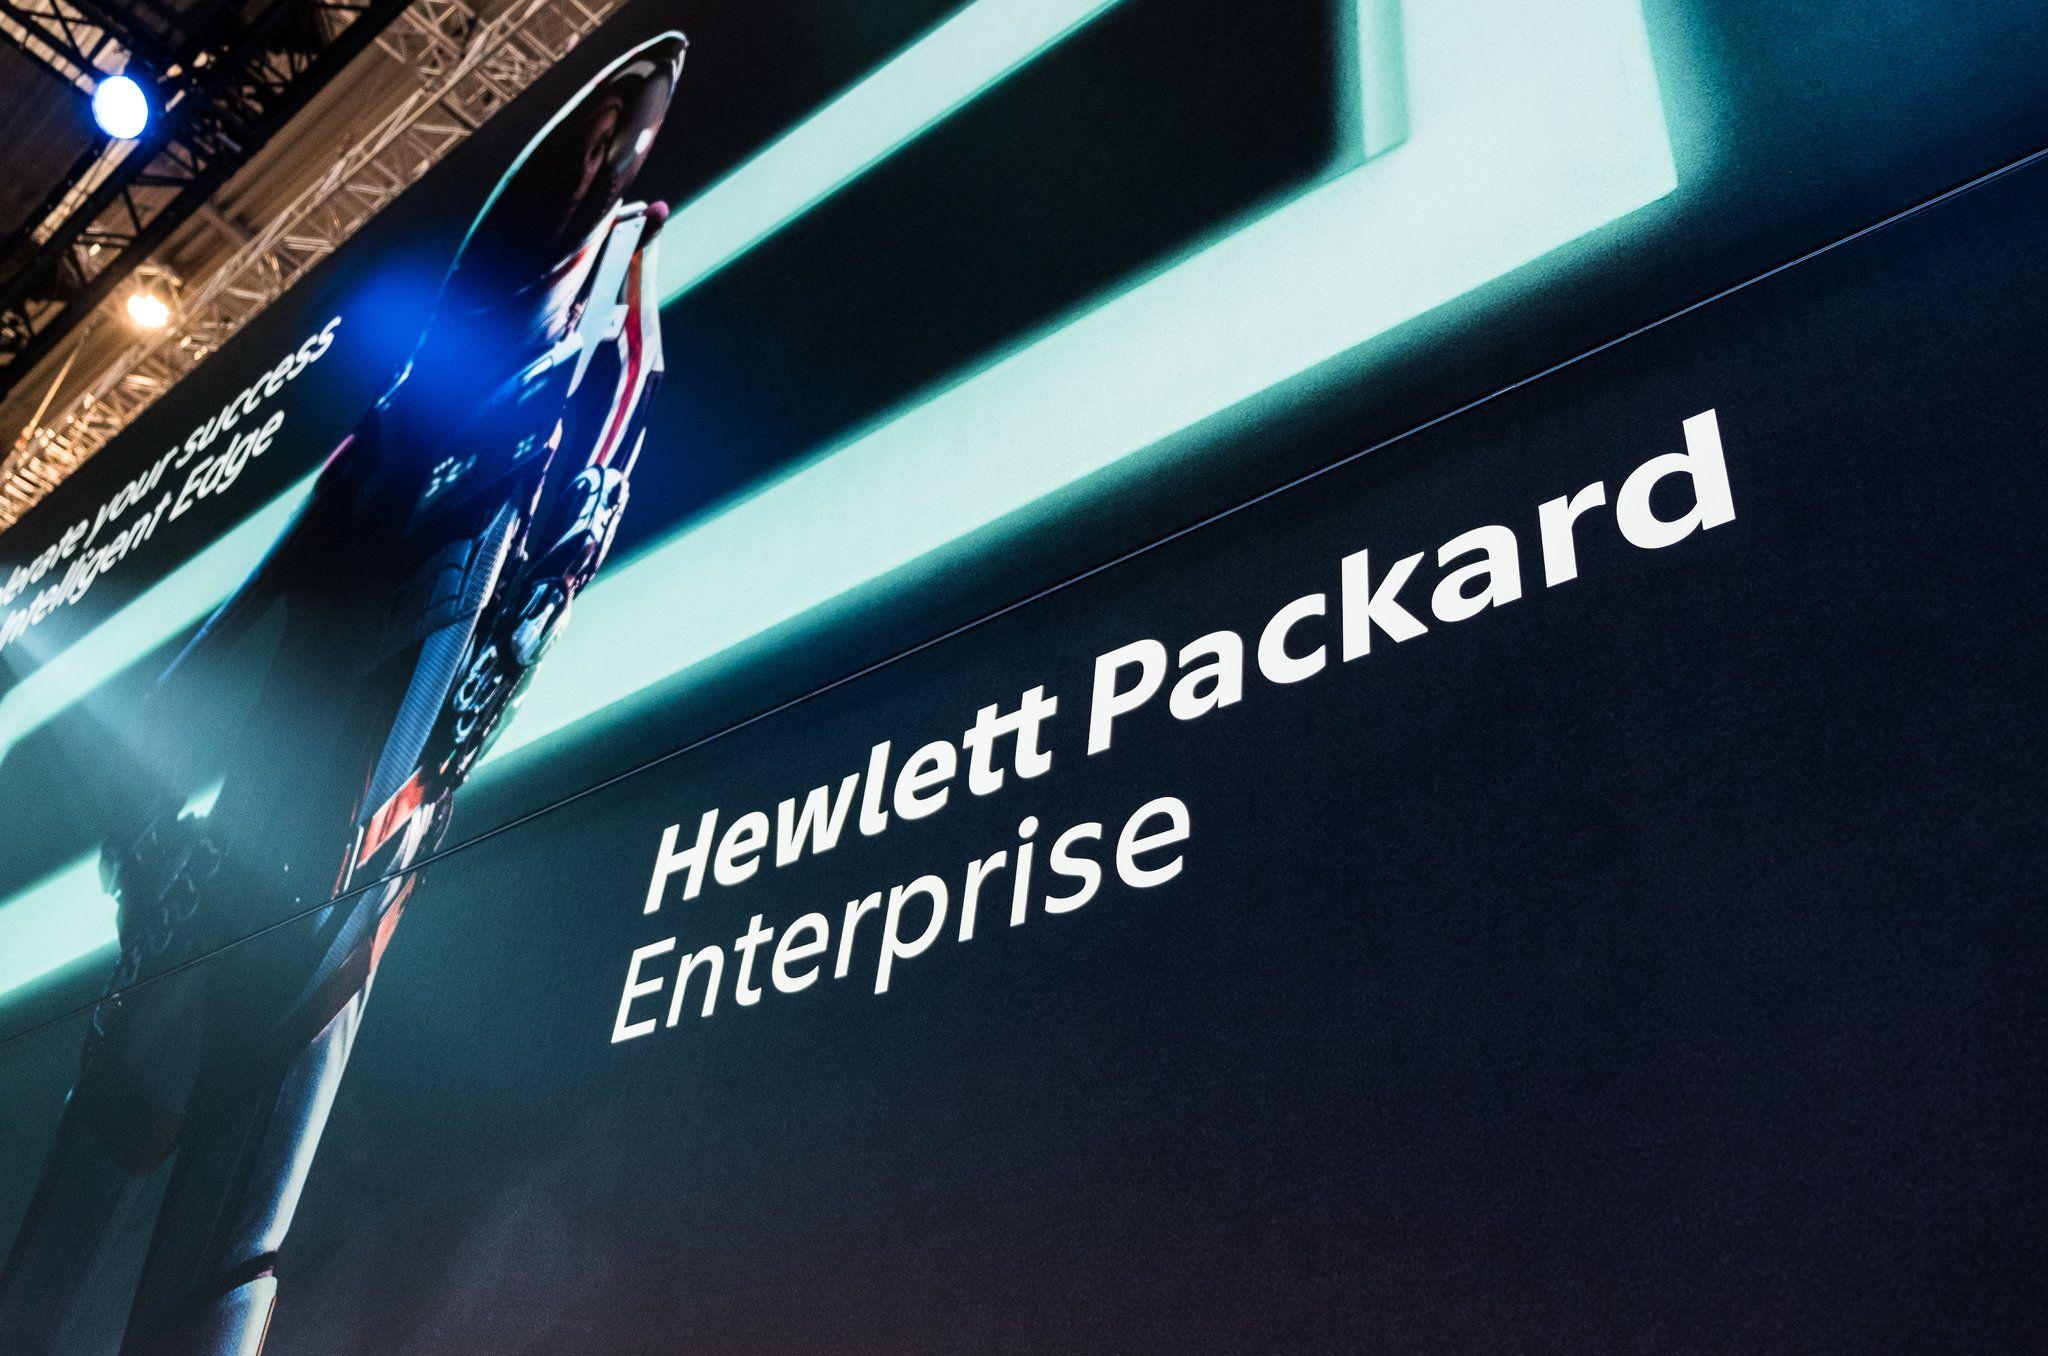 Hewlett Packard станет стратегическим партнером СК «Евразия» 478468 - Kapital.kz